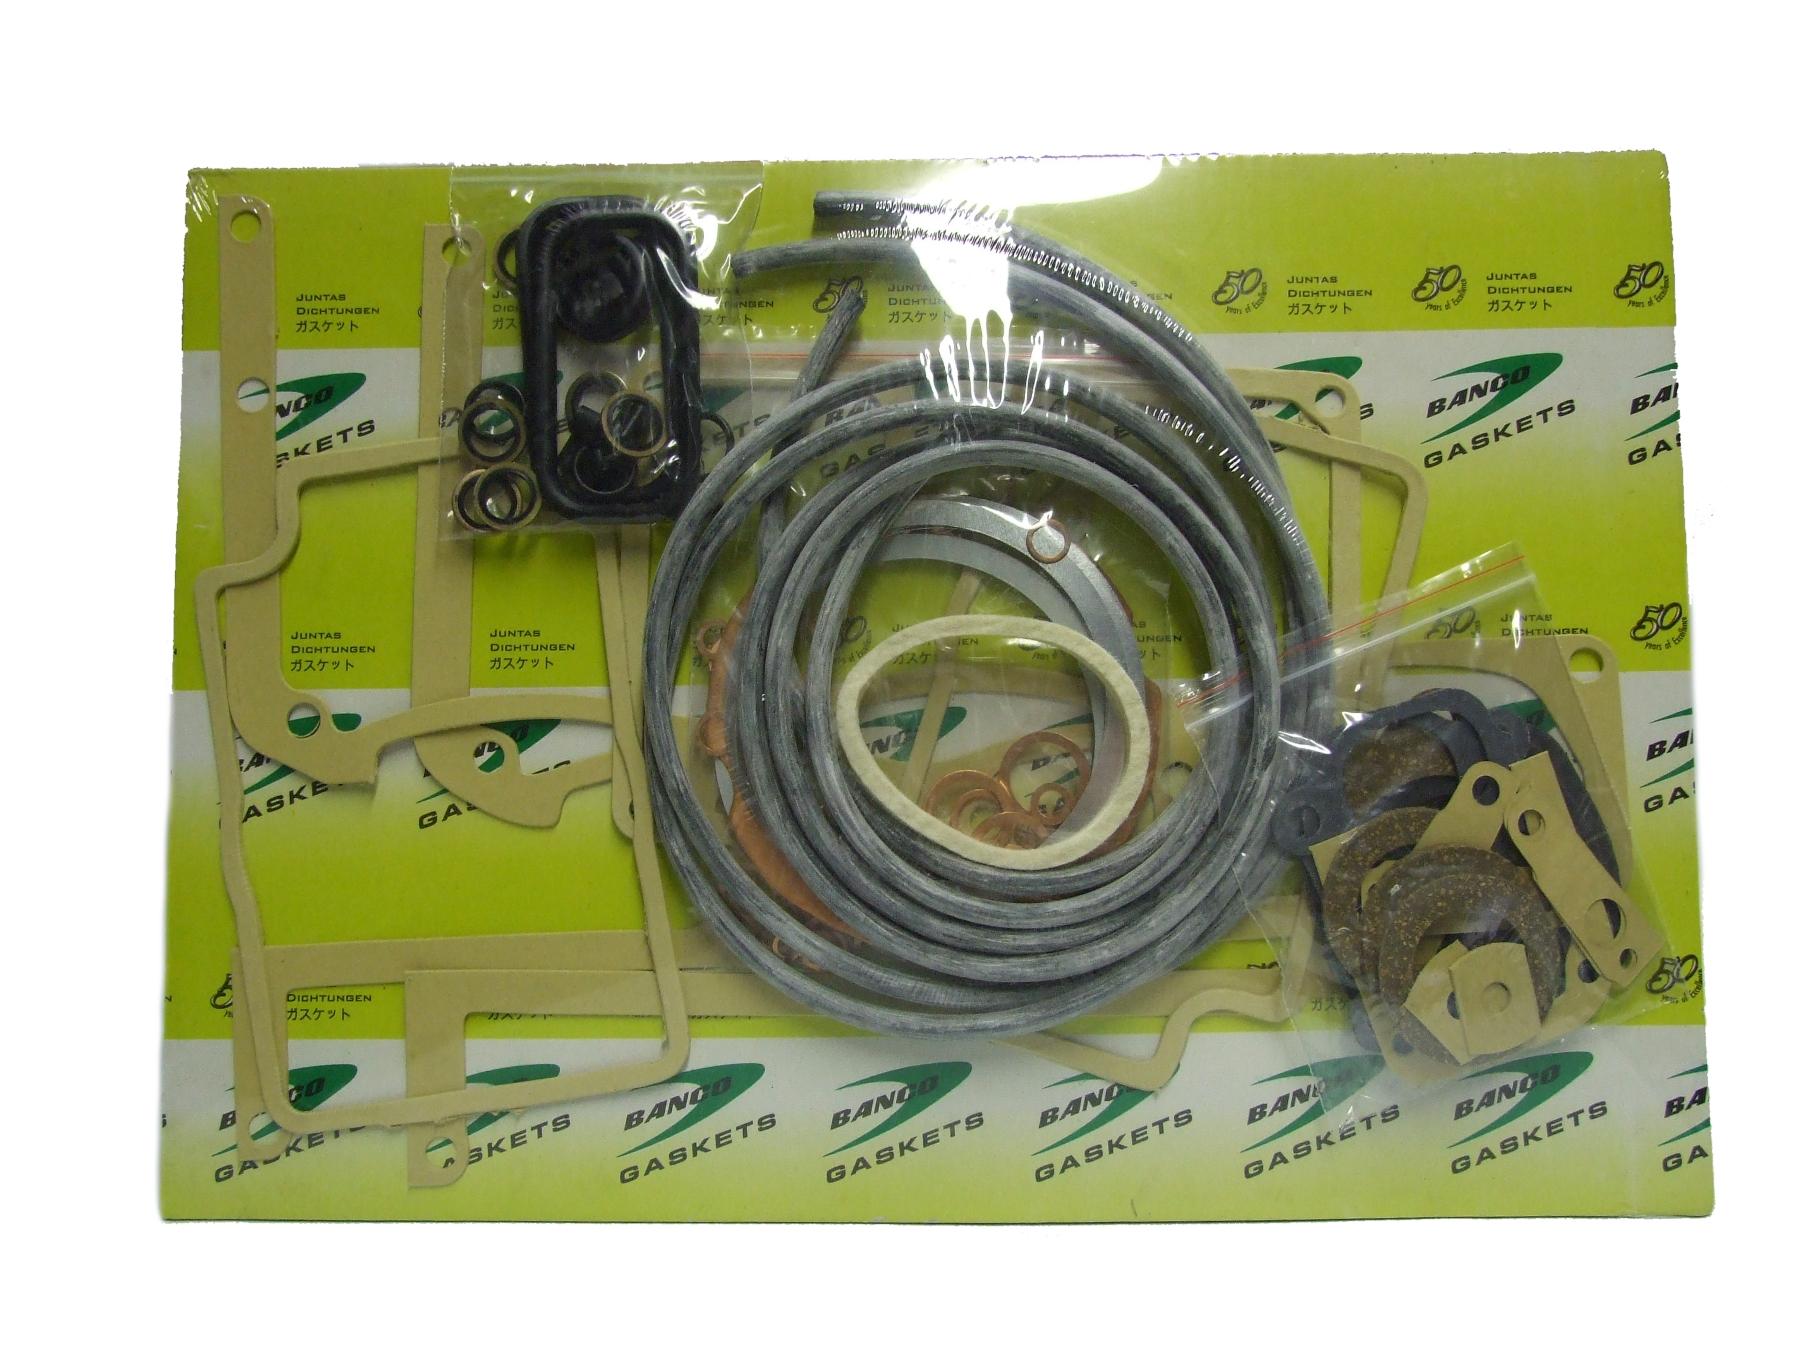 Full Gasket Set Equivalent to Lister Petter P//N 657-19686 Lister HR2 Overhaul